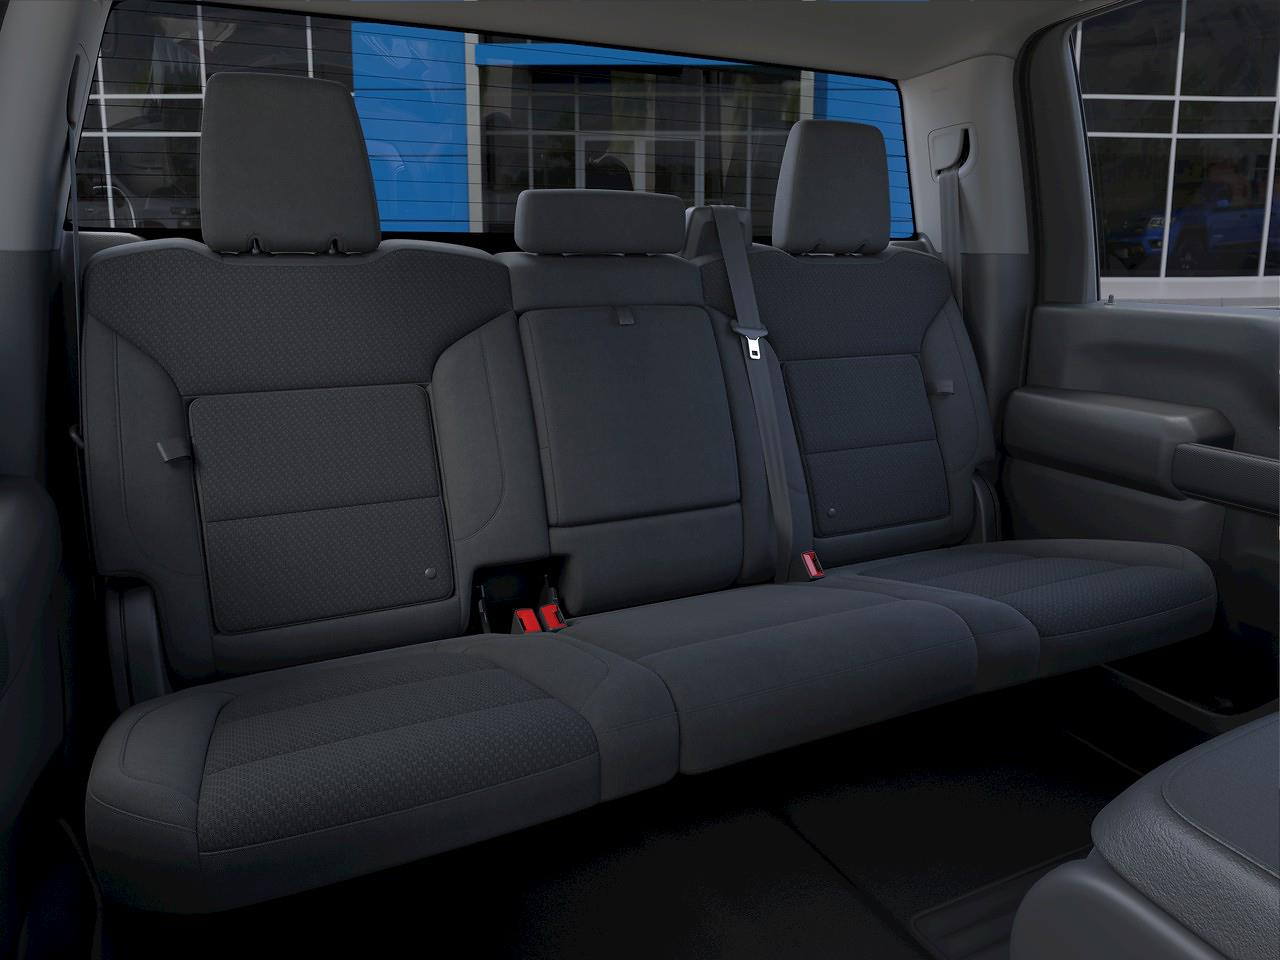 2021 Chevrolet Silverado 2500 Crew Cab 4x4, Pickup #Q210448 - photo 14